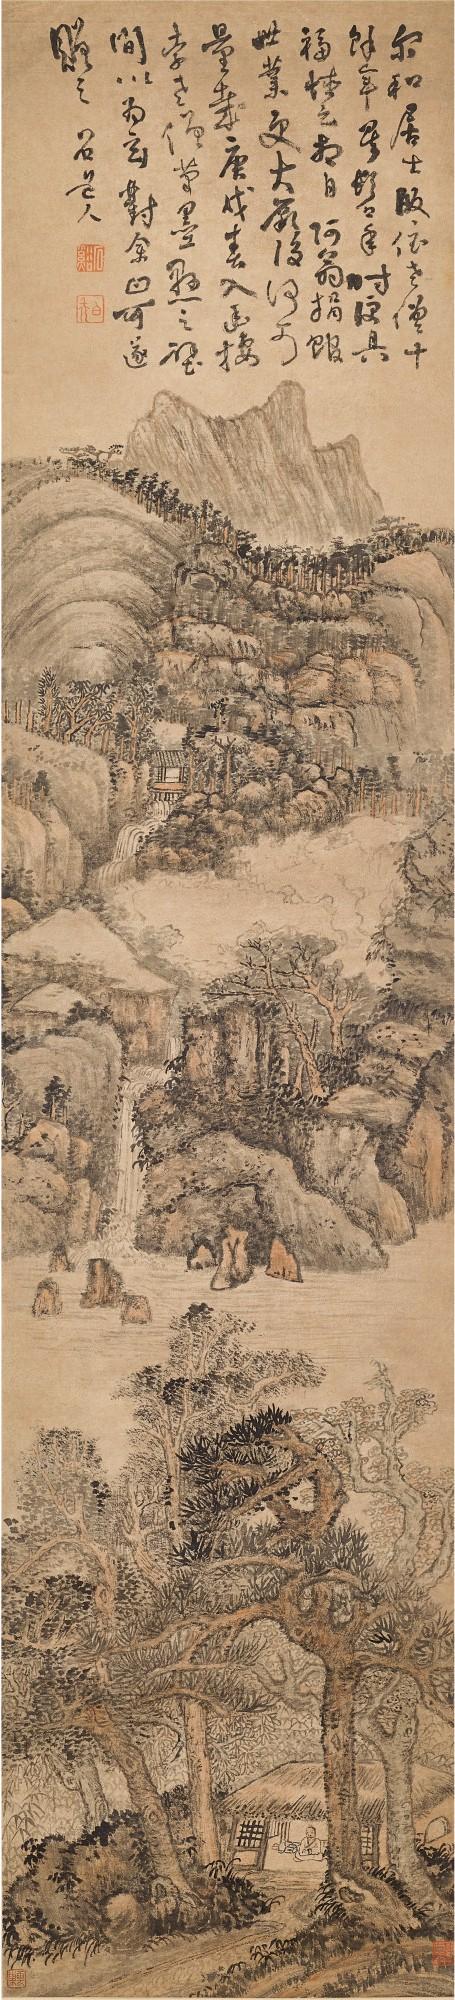 View full screen - View 1 of Lot 3074. Kuncan 1612-circa 1674 髡殘 (1612-約1674)   Misty Mountain 雲山玄對圖.